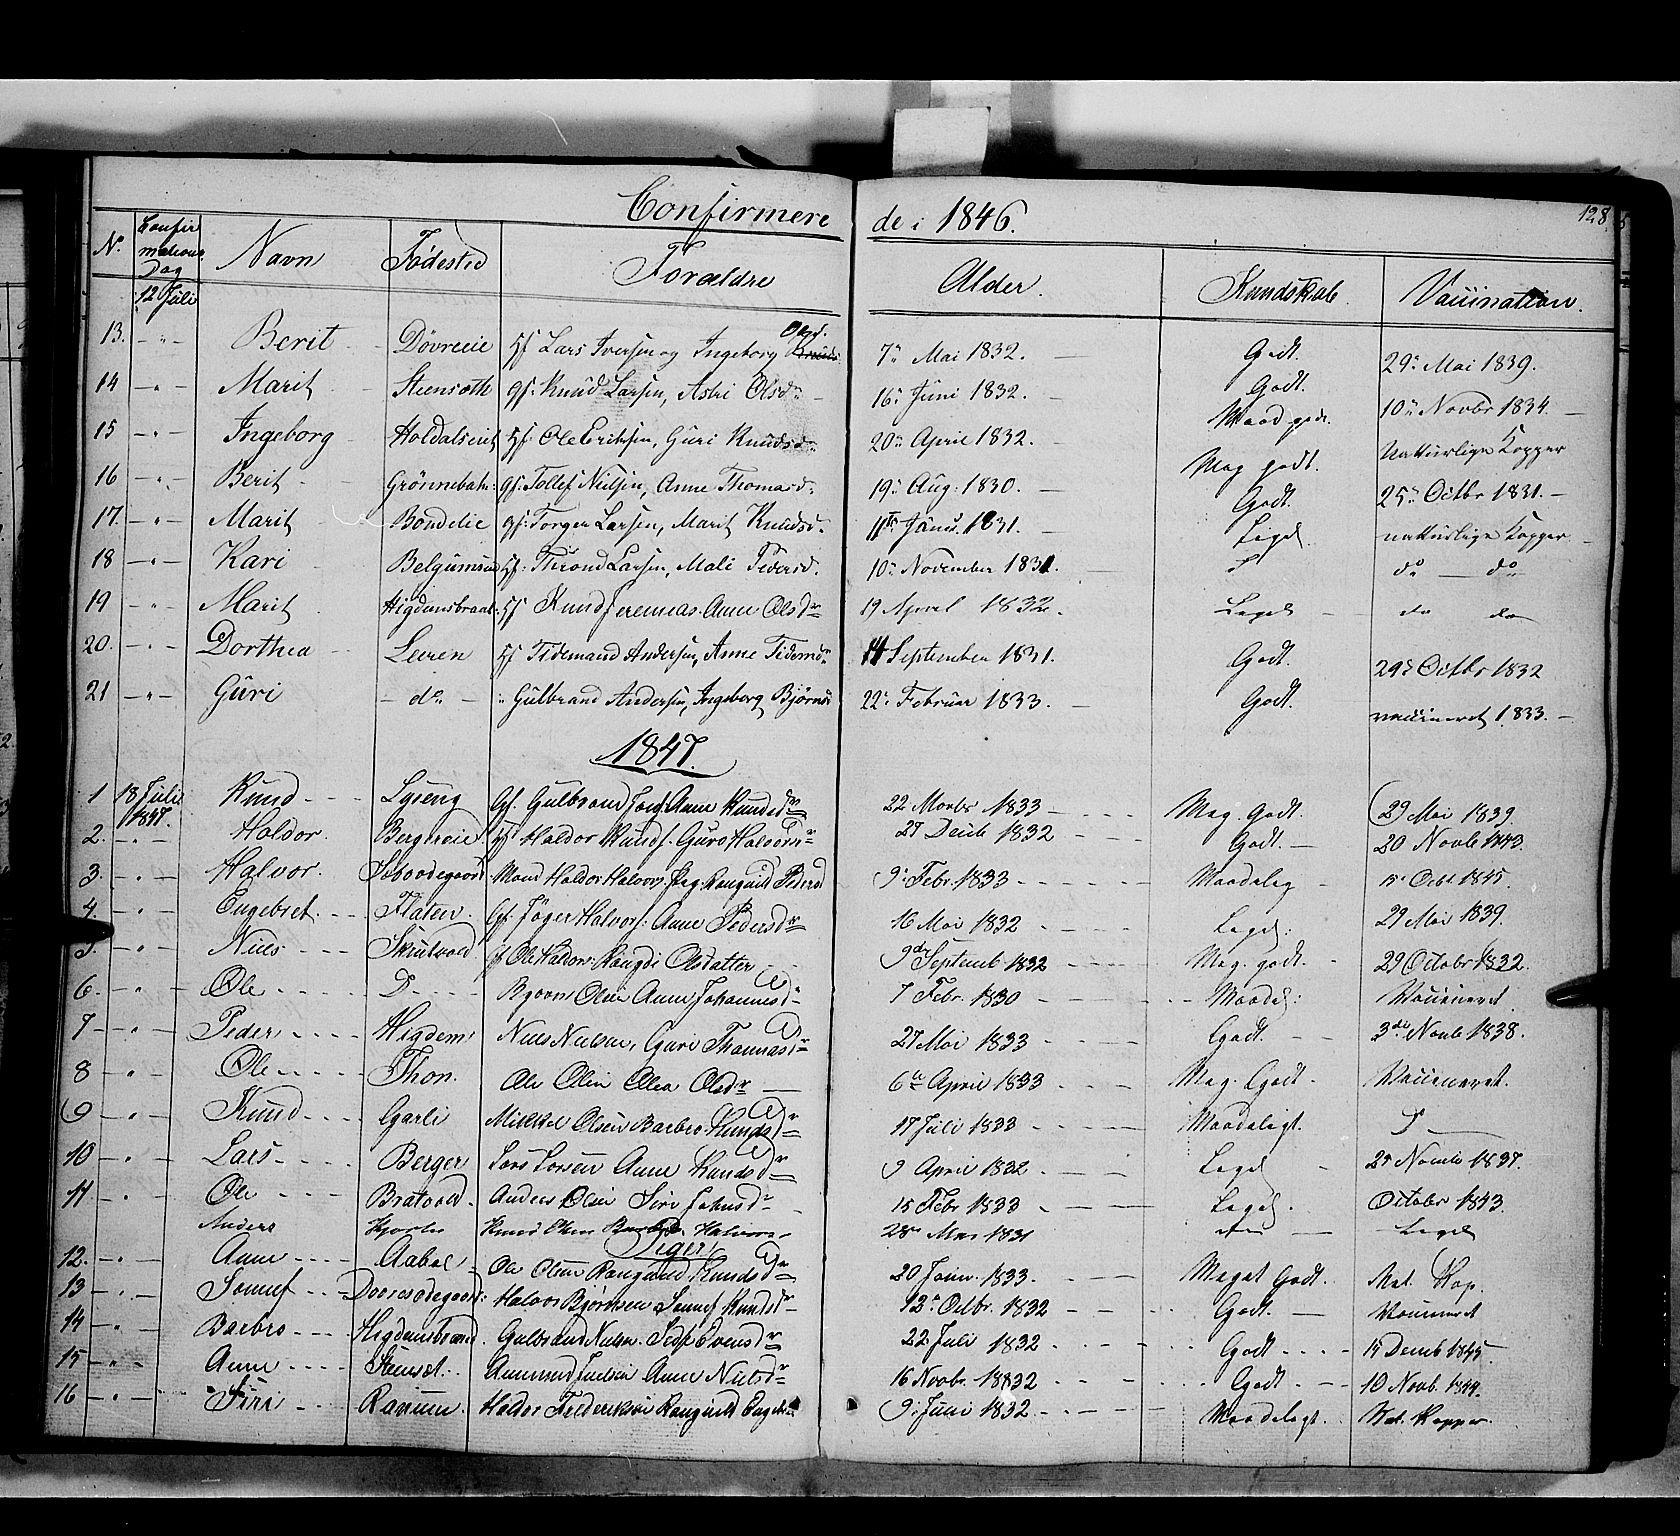 SAH, Nord-Aurdal prestekontor, Ministerialbok nr. 7, 1842-1863, s. 128